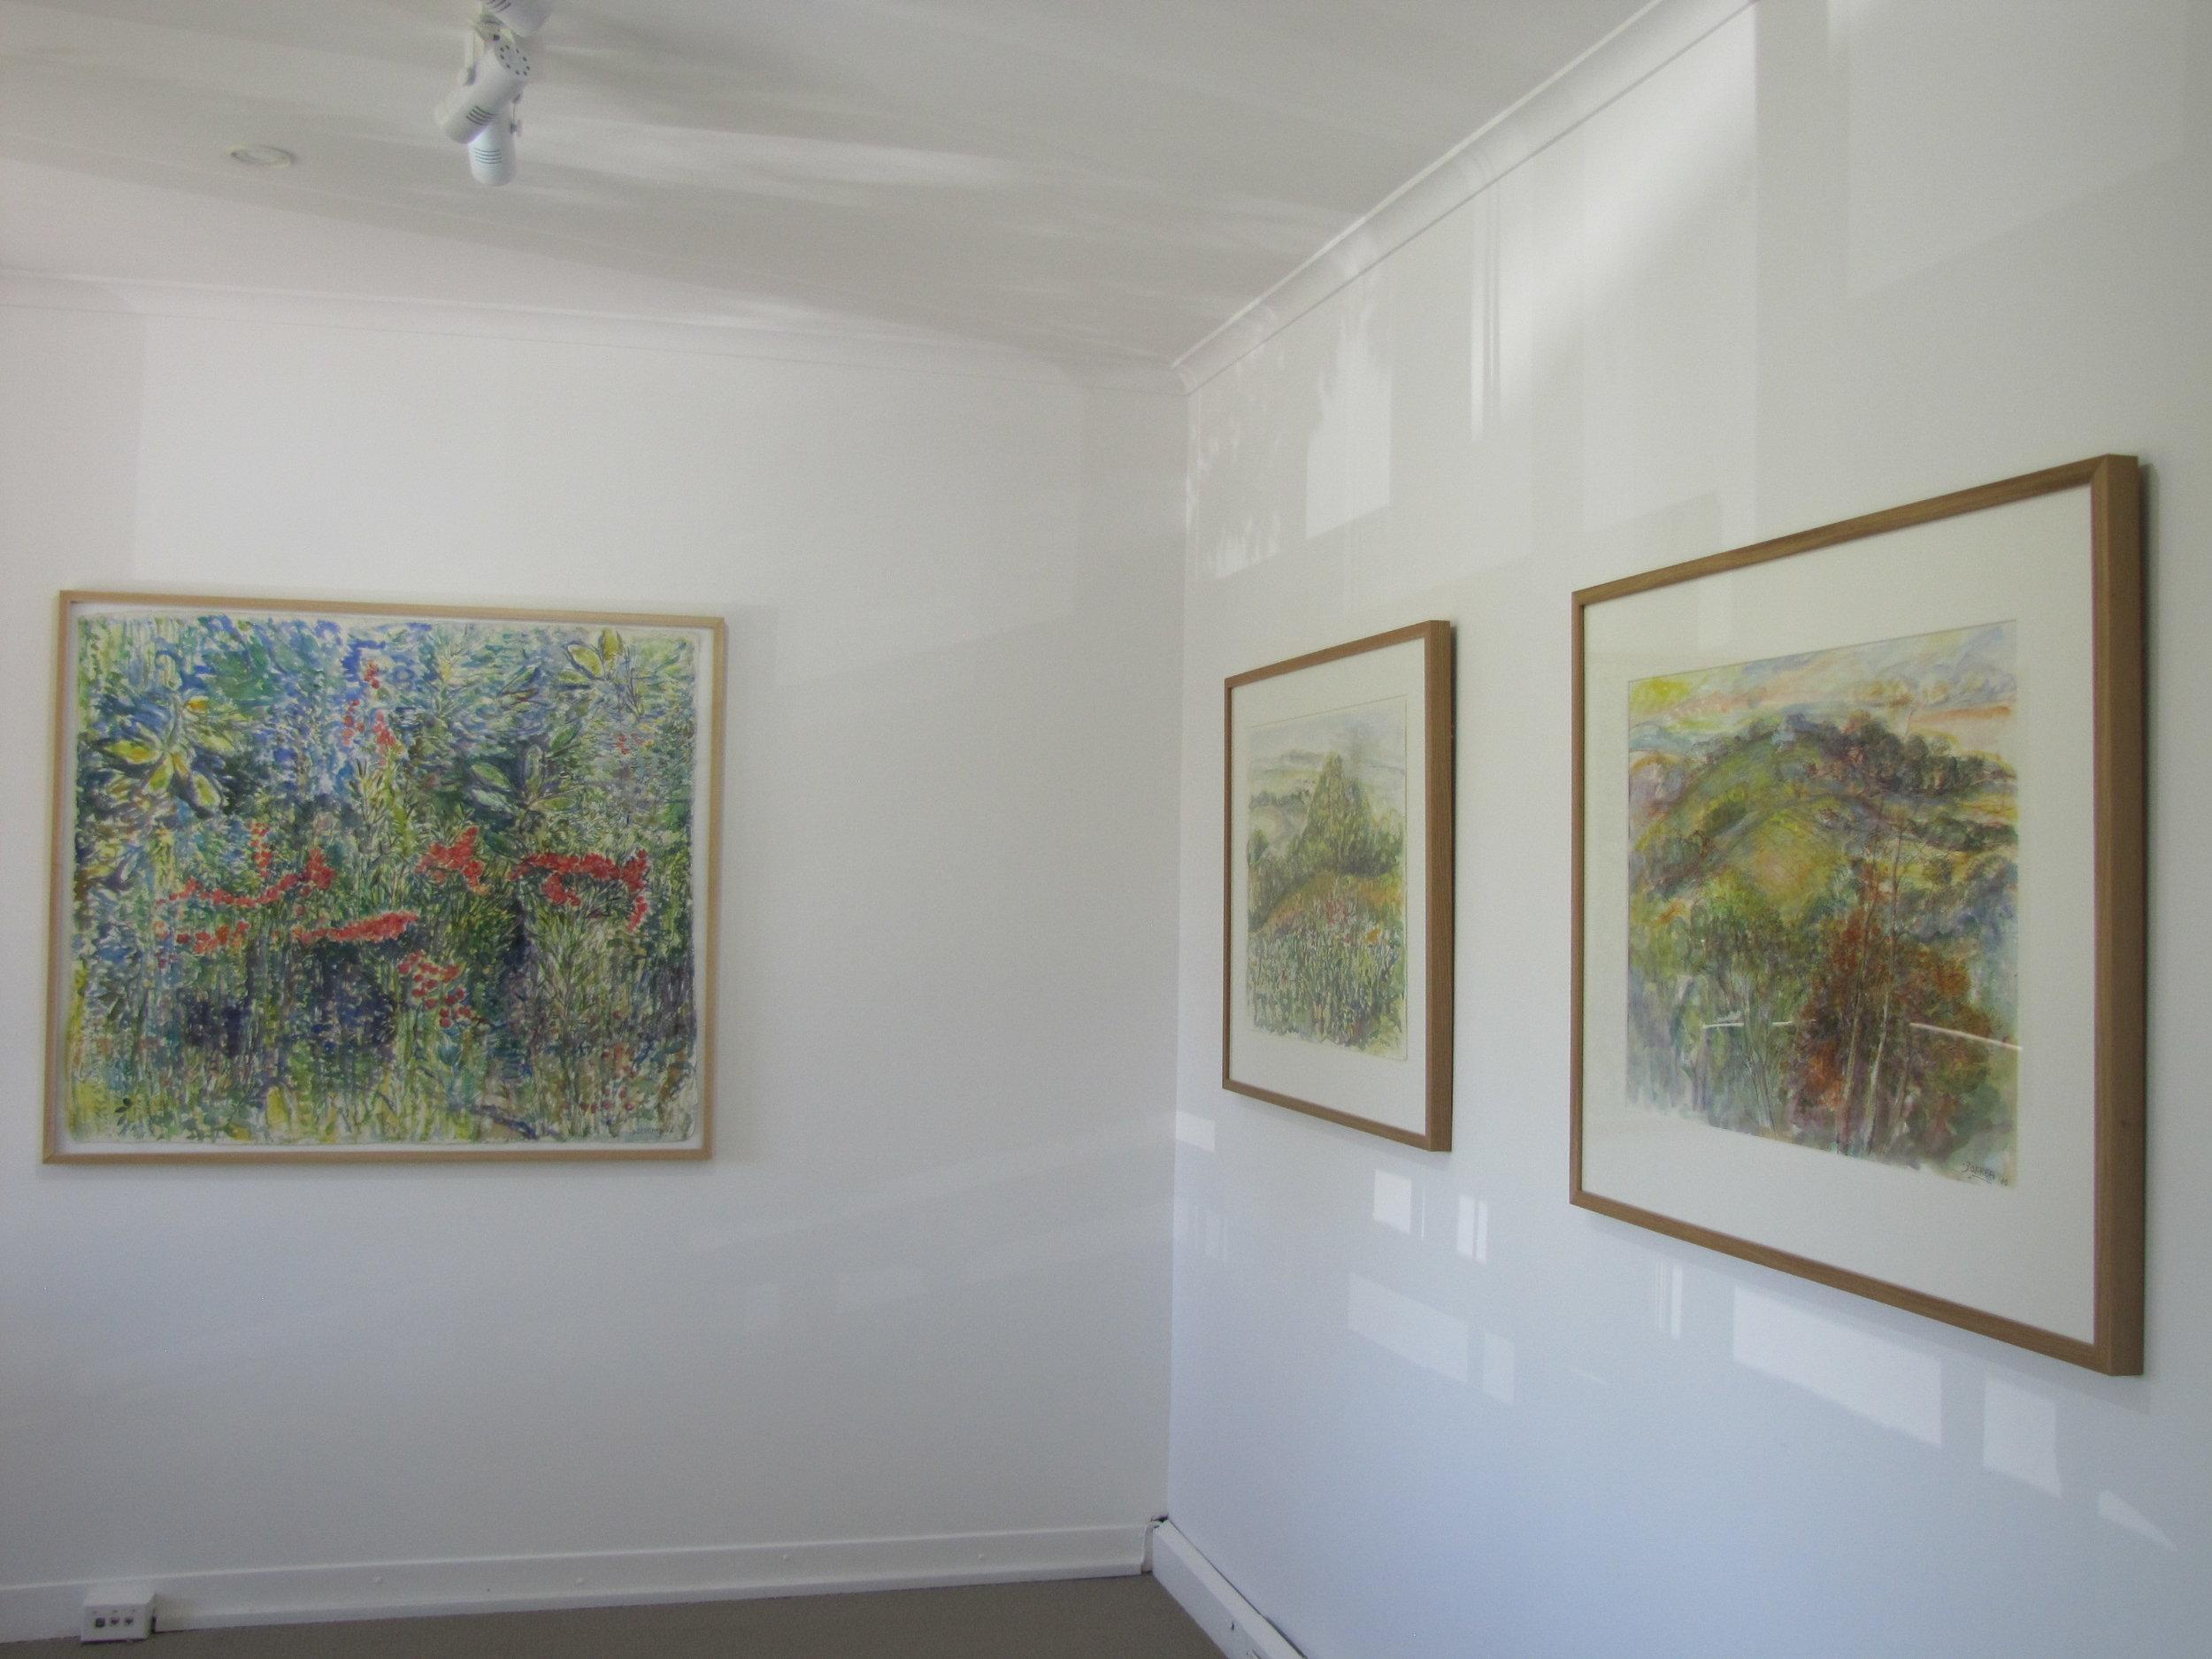 NSG. Zofrea exhibition. Exhibition view 9.jpg